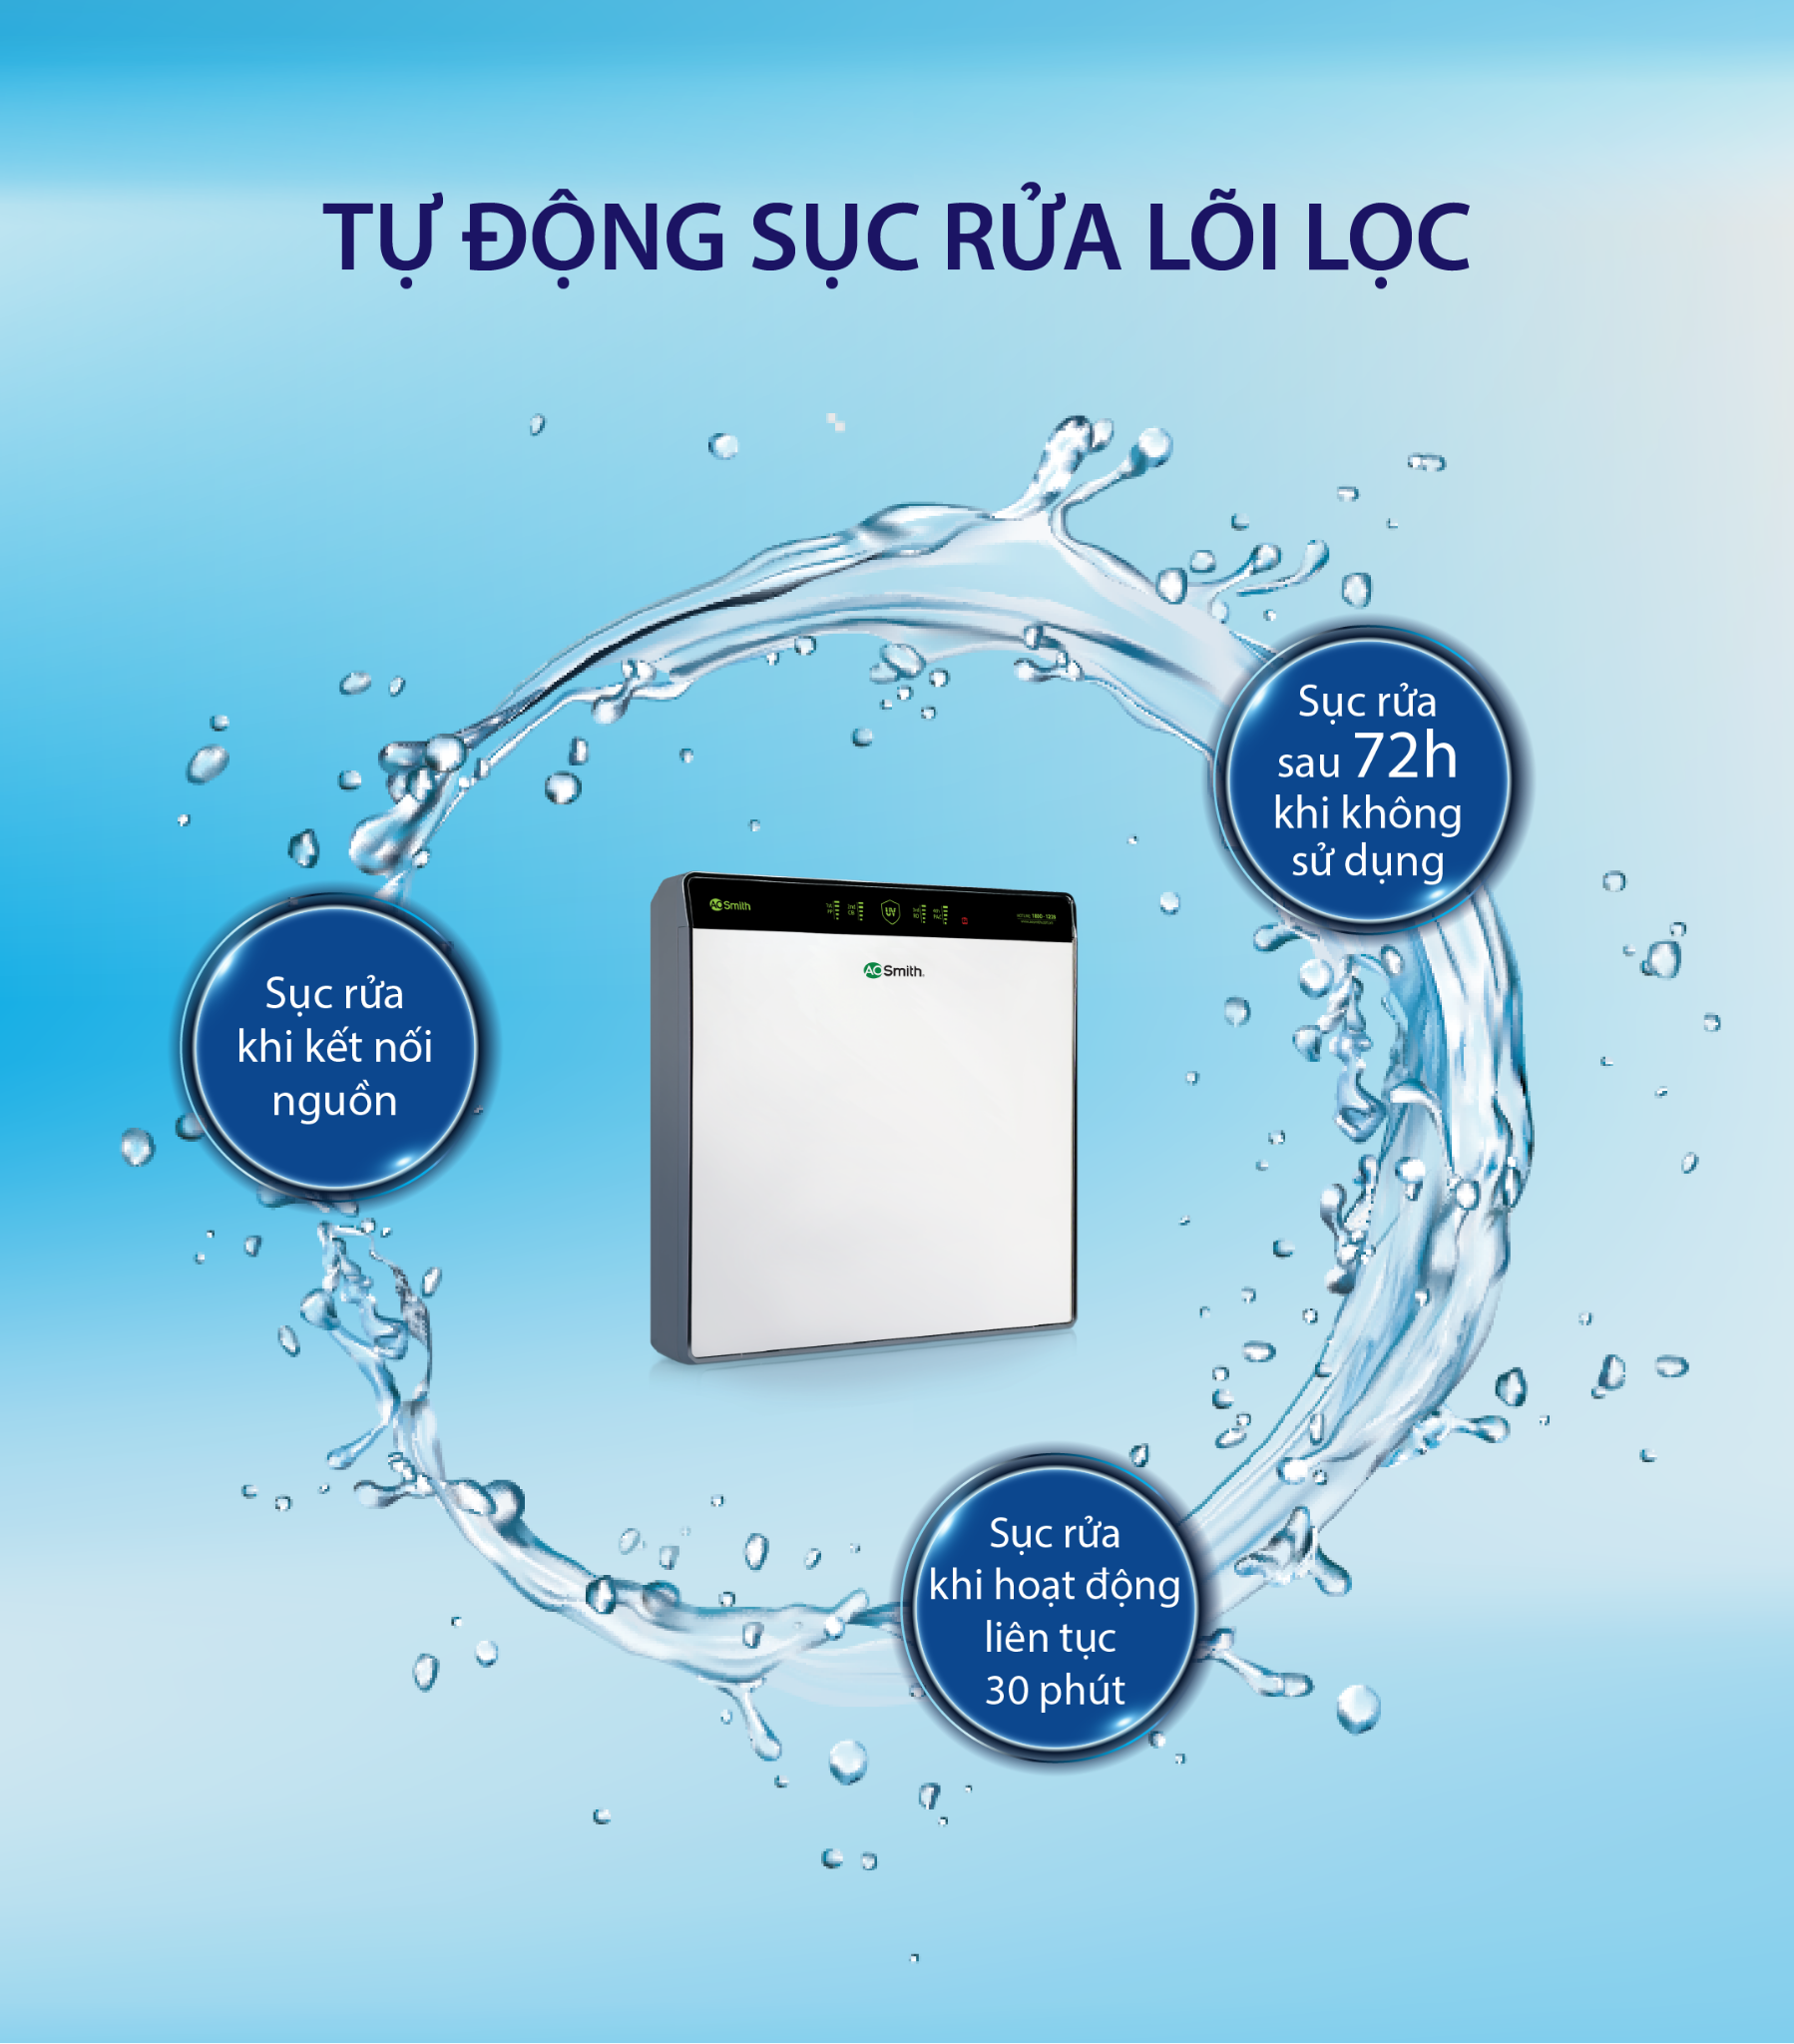 website a o 2018 11 cc206f5a102b4b5585bd7e8f105d628c tại Đà Nẵng